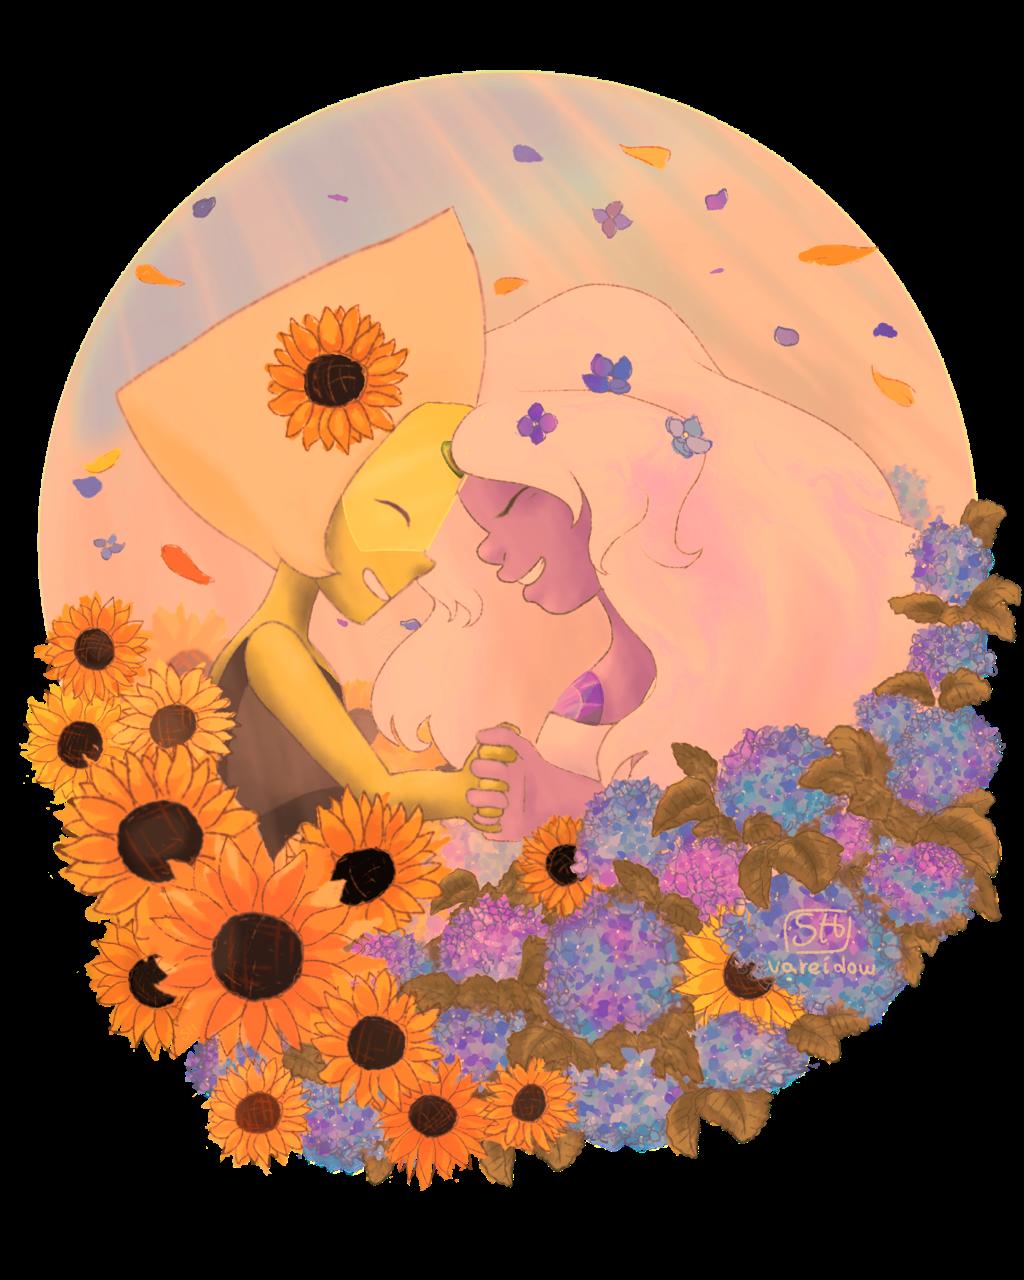 Sunflowers and Hydrangeas 💚💜